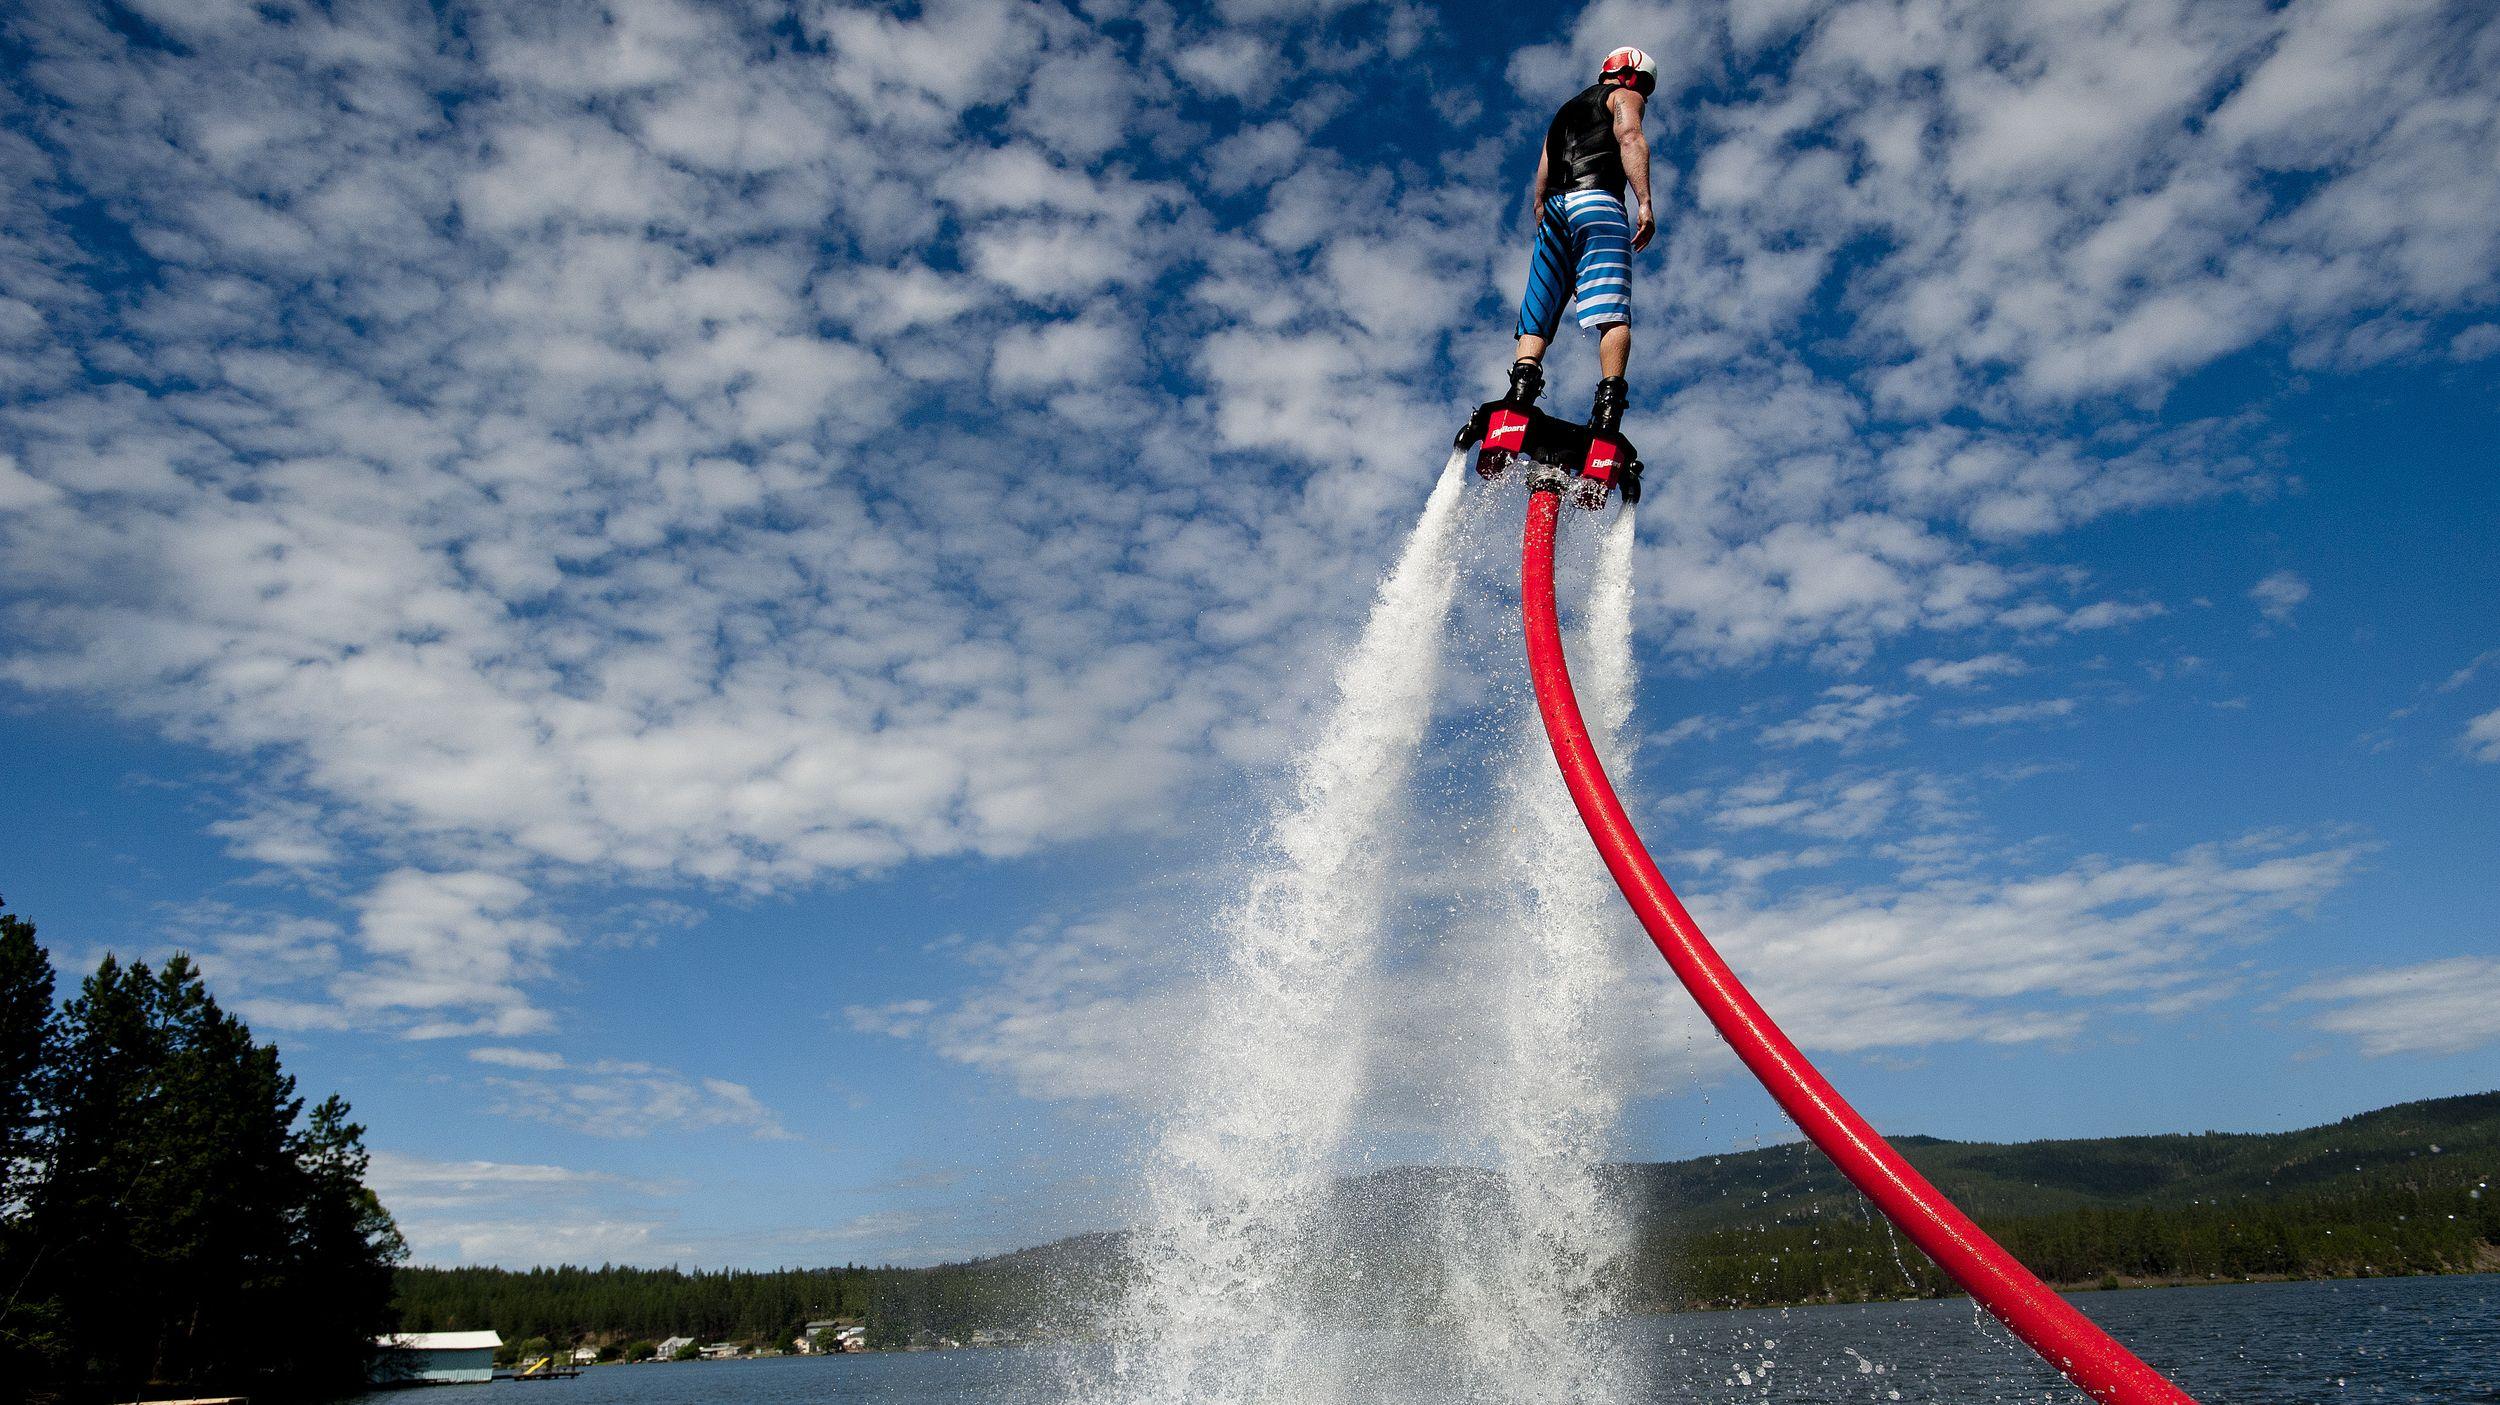 About Sunshine Water sports Destin: